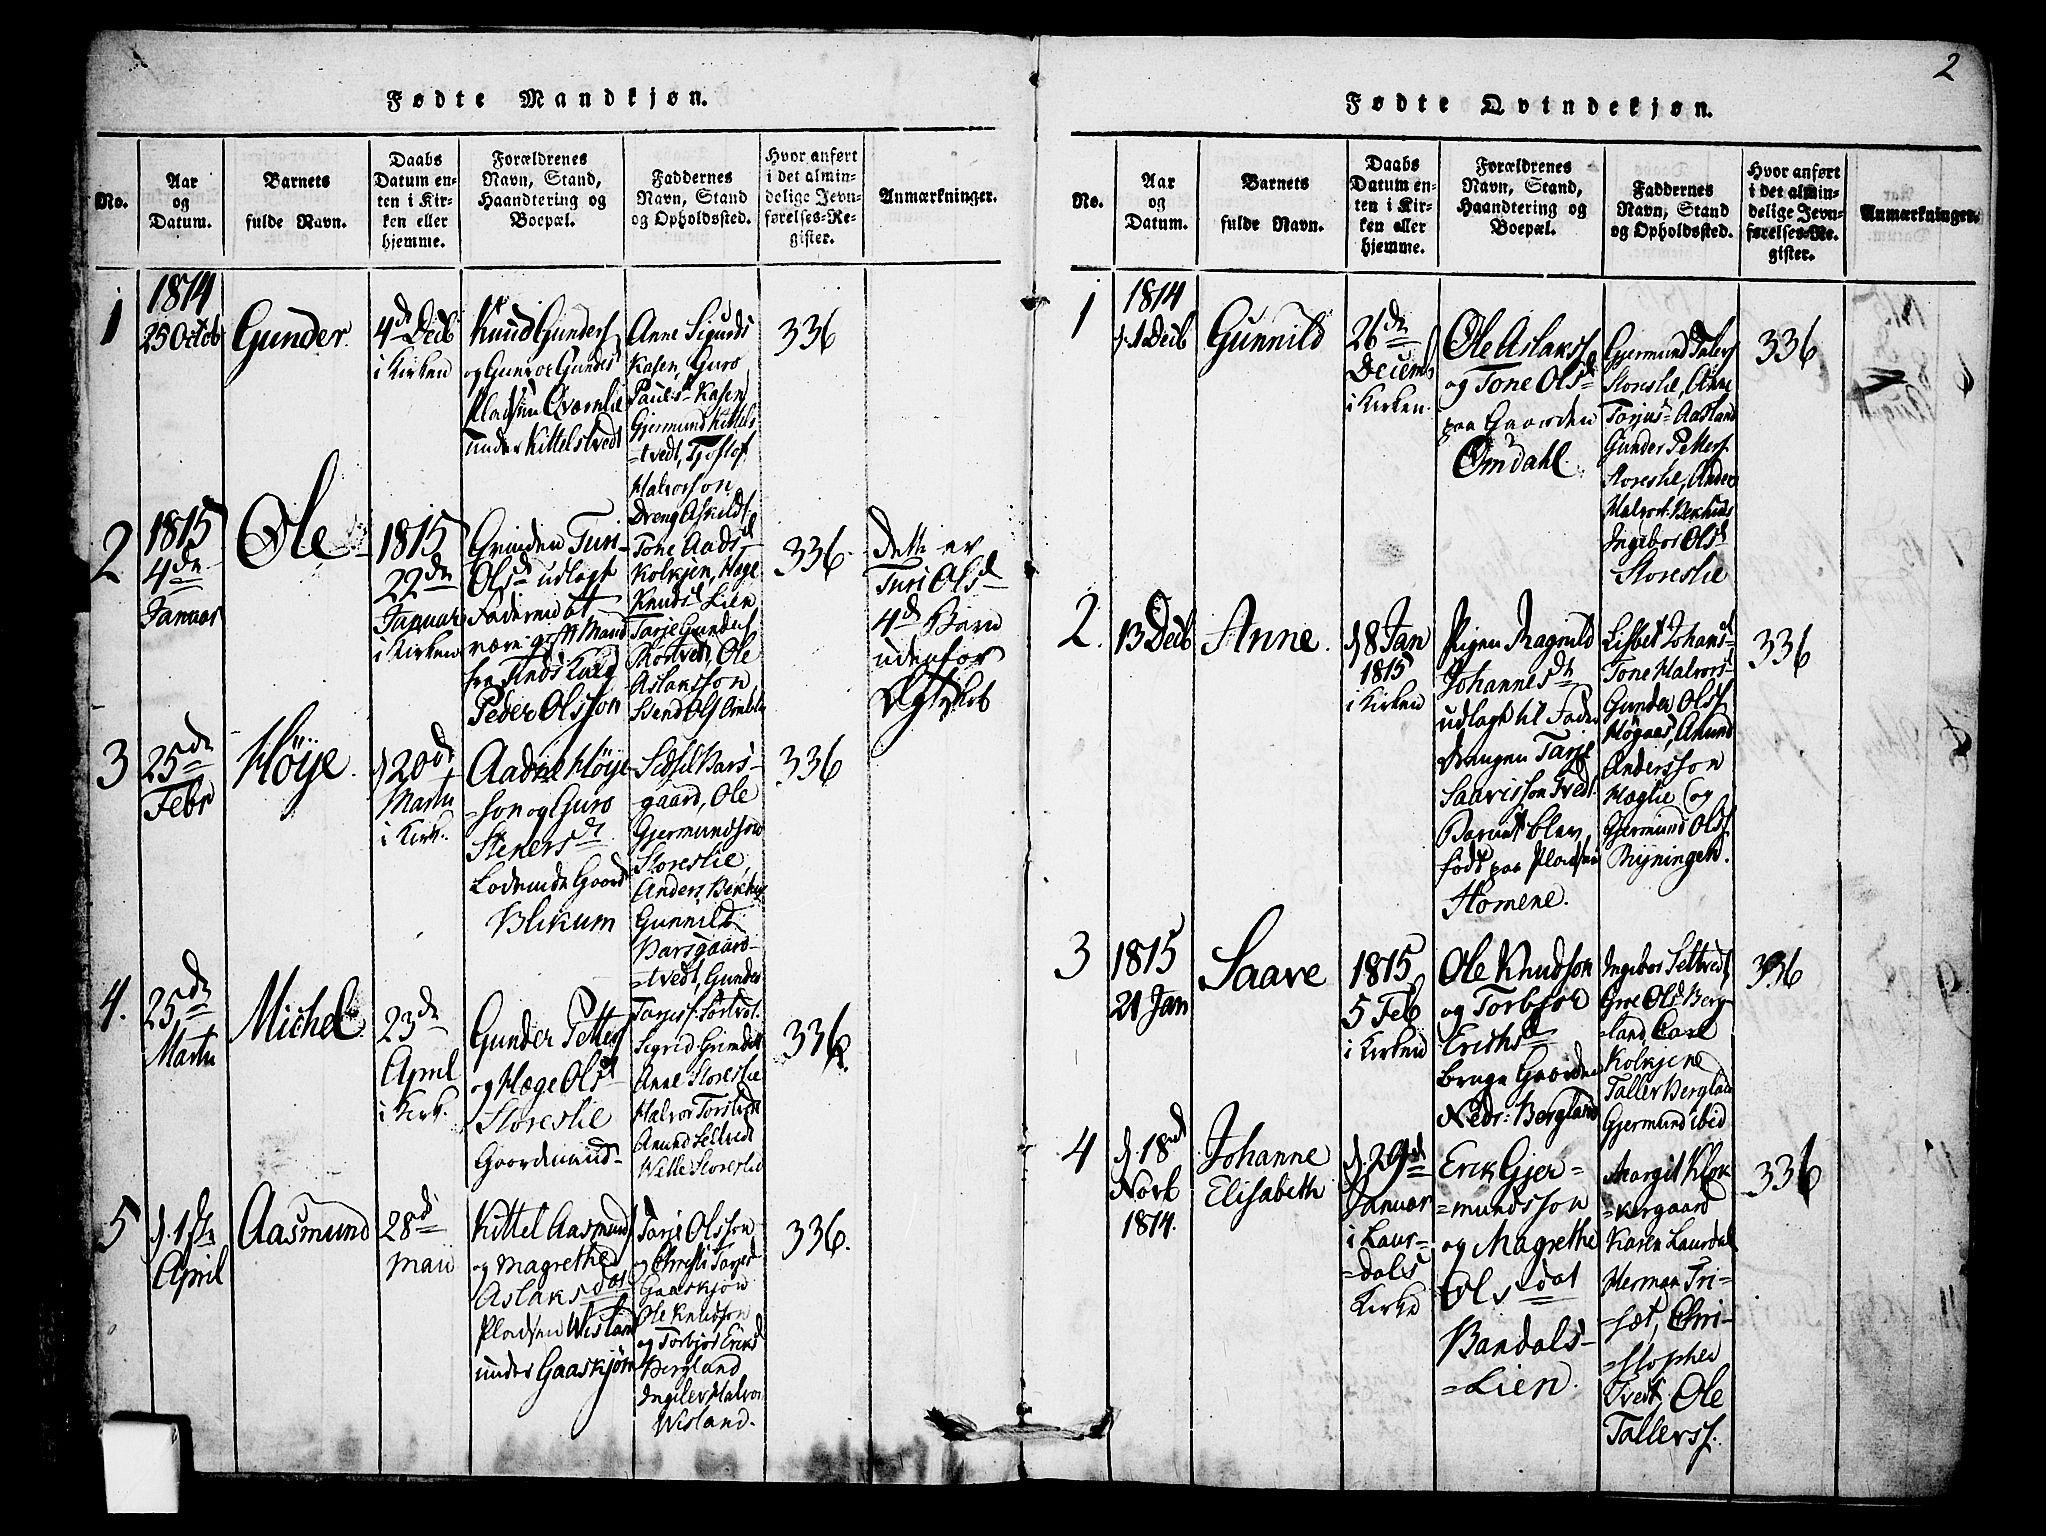 SAKO, Mo kirkebøker, F/Fb/L0001: Ministerialbok nr. II 1, 1814-1844, s. 2